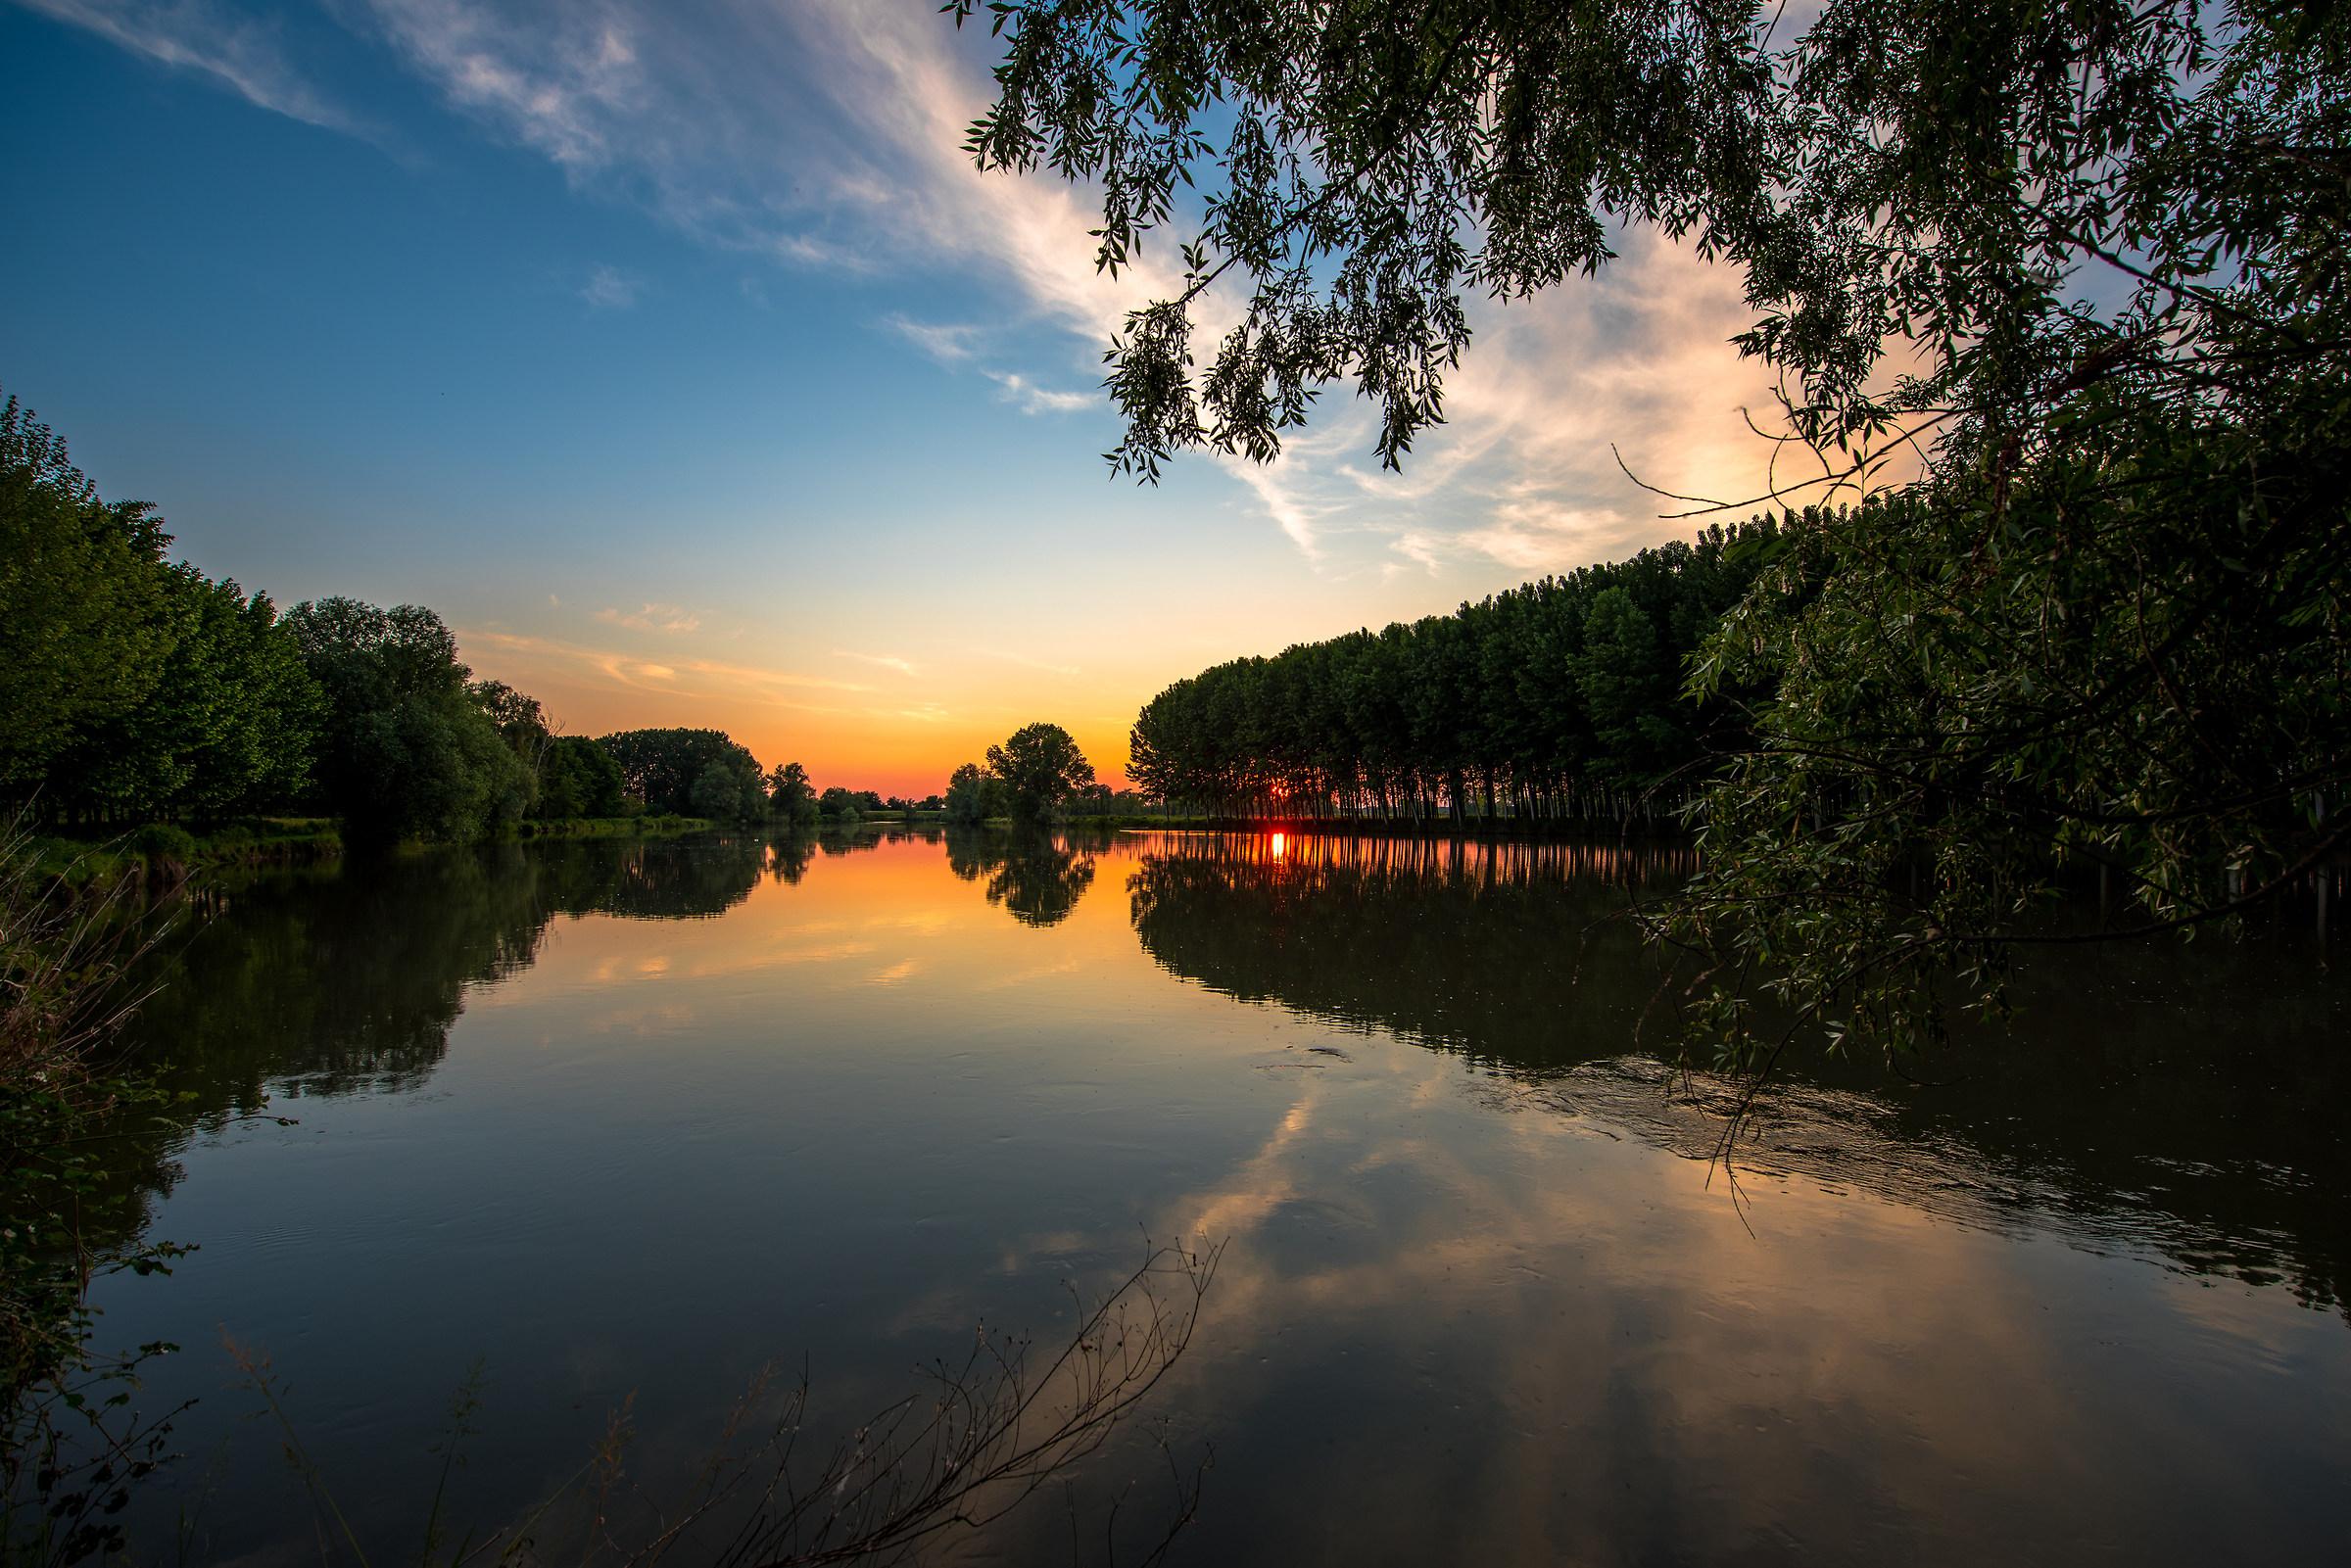 Sunset on the River Oglio...